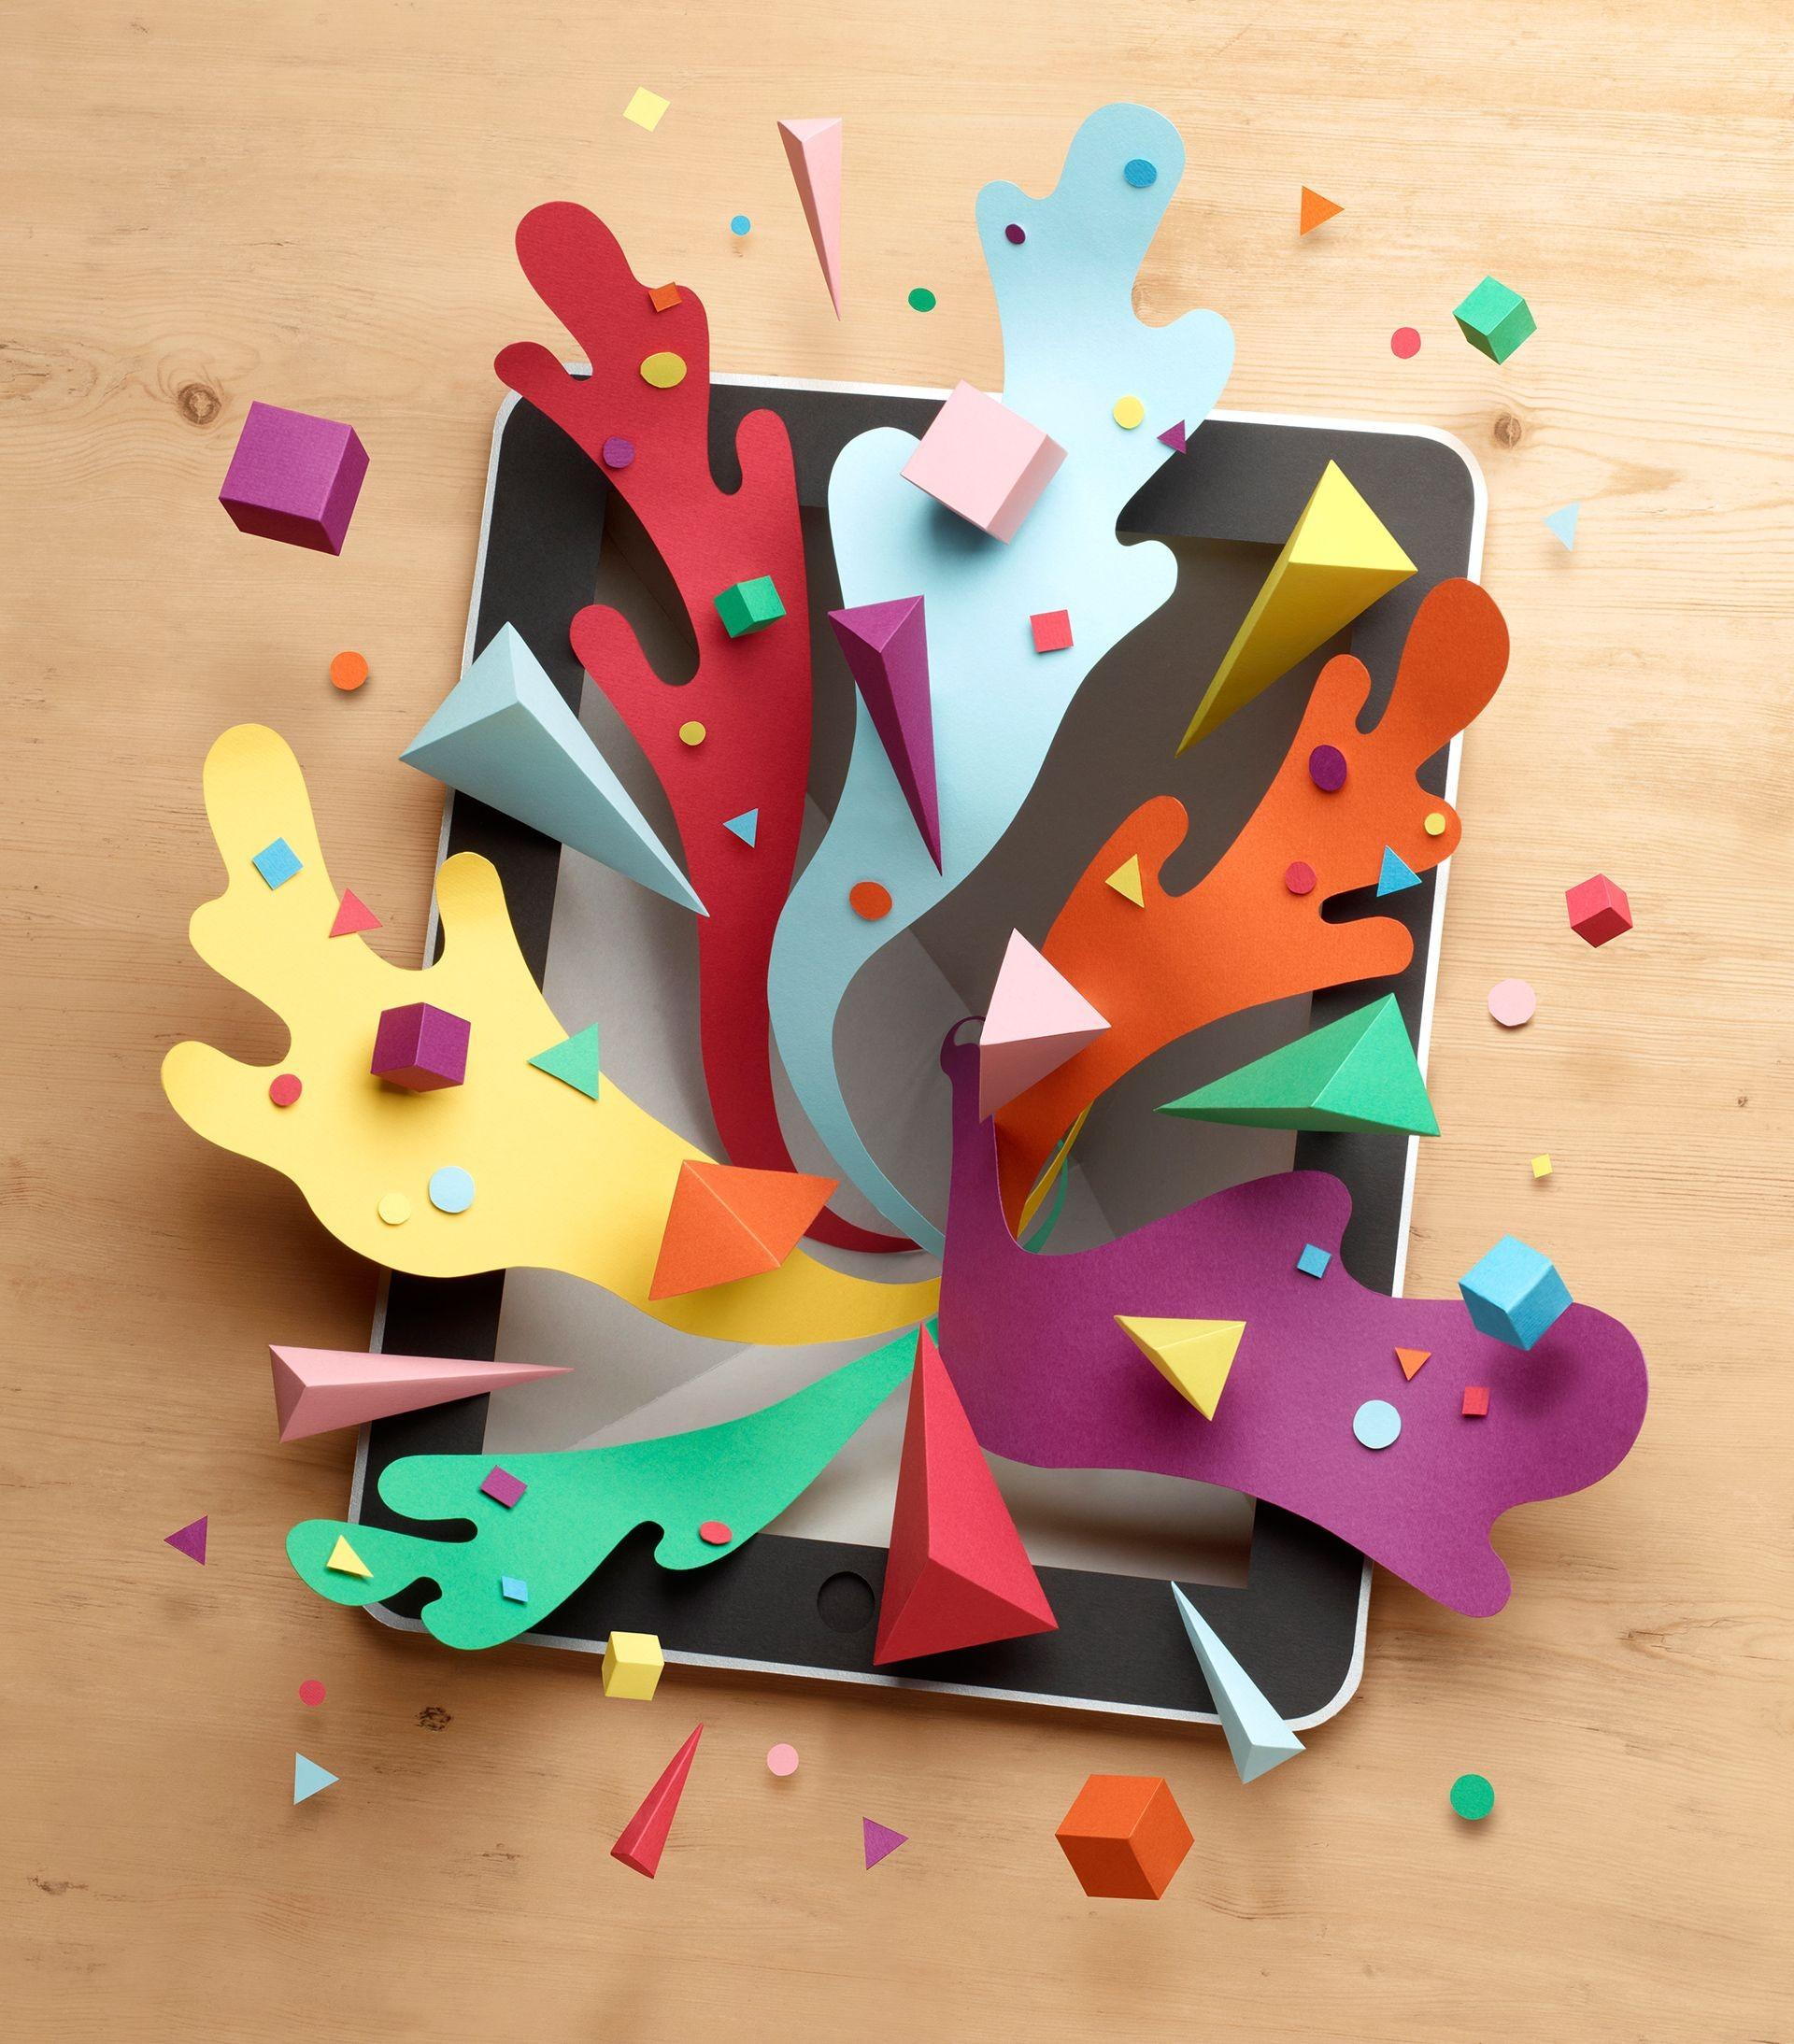 Papercraft App Ipad Explosion by Owen Gildersleeve